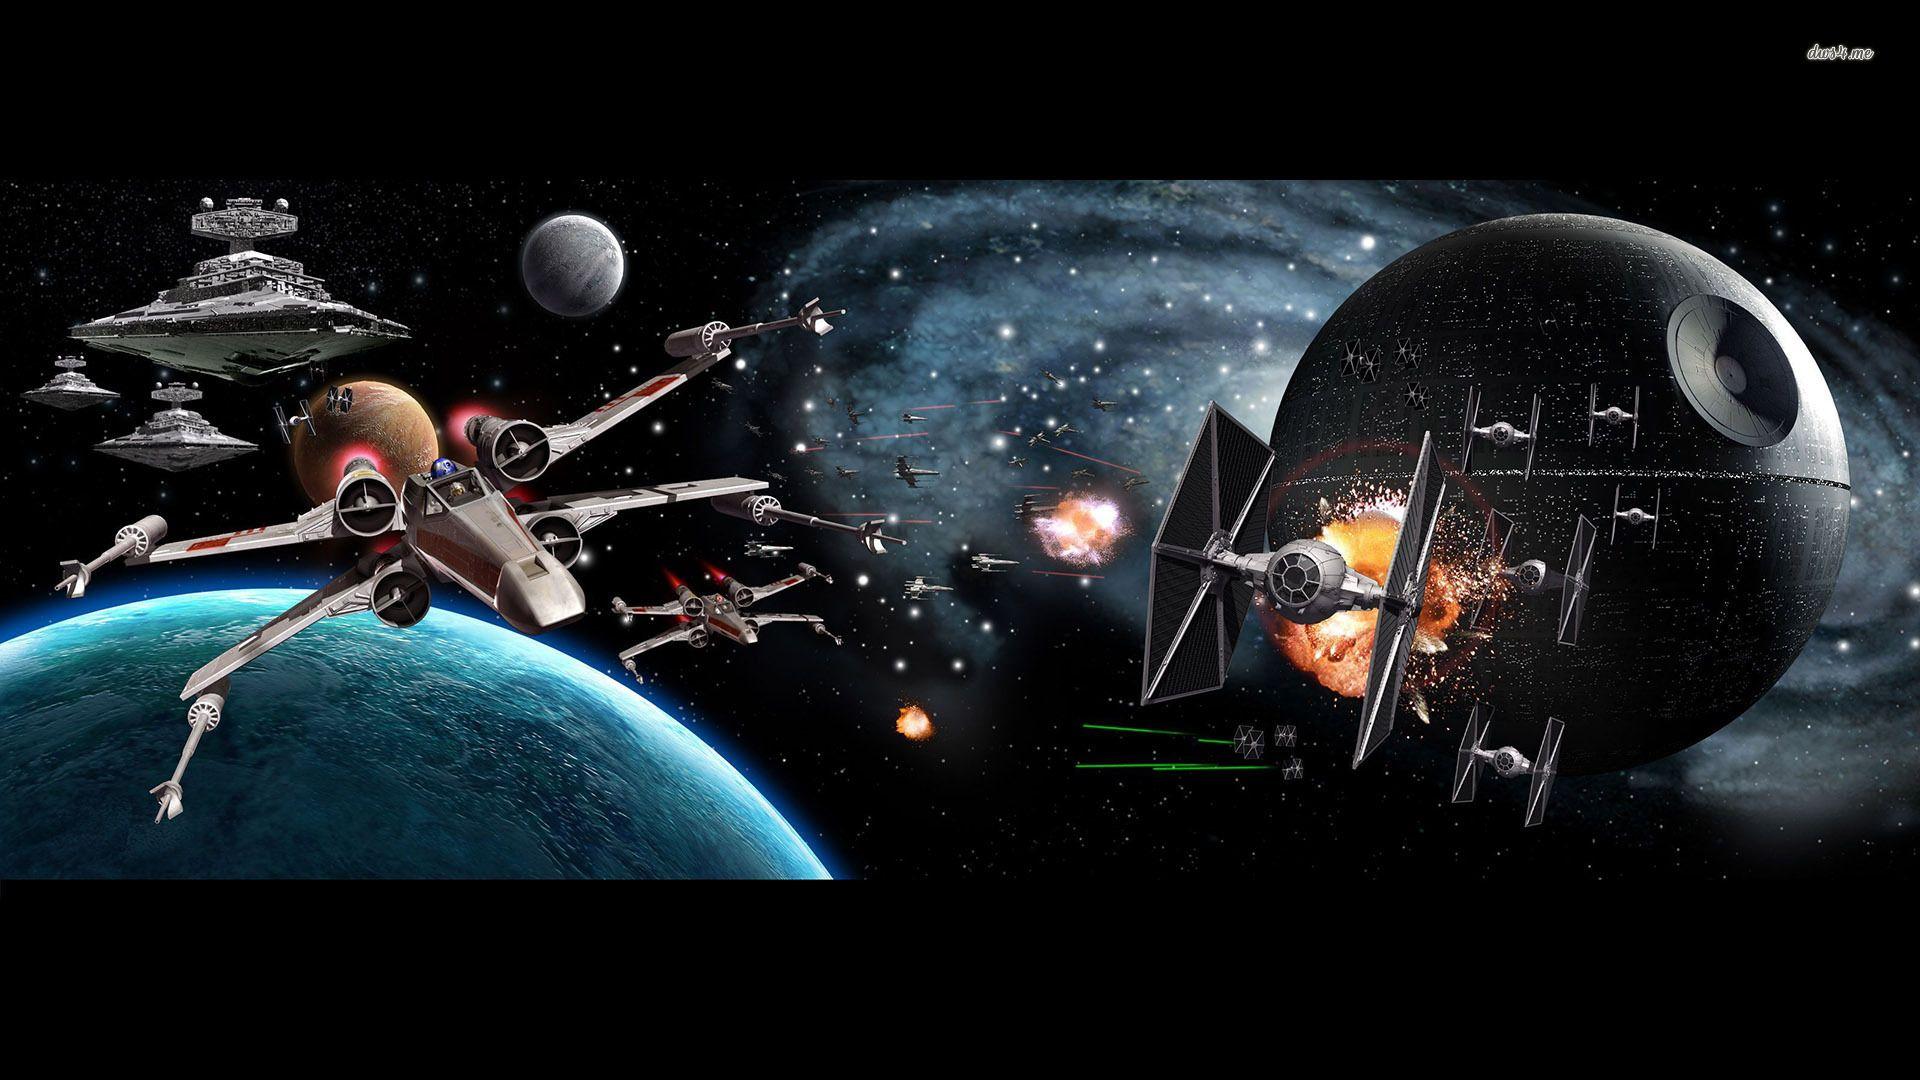 Star Wars Screensaver free download wallpaper